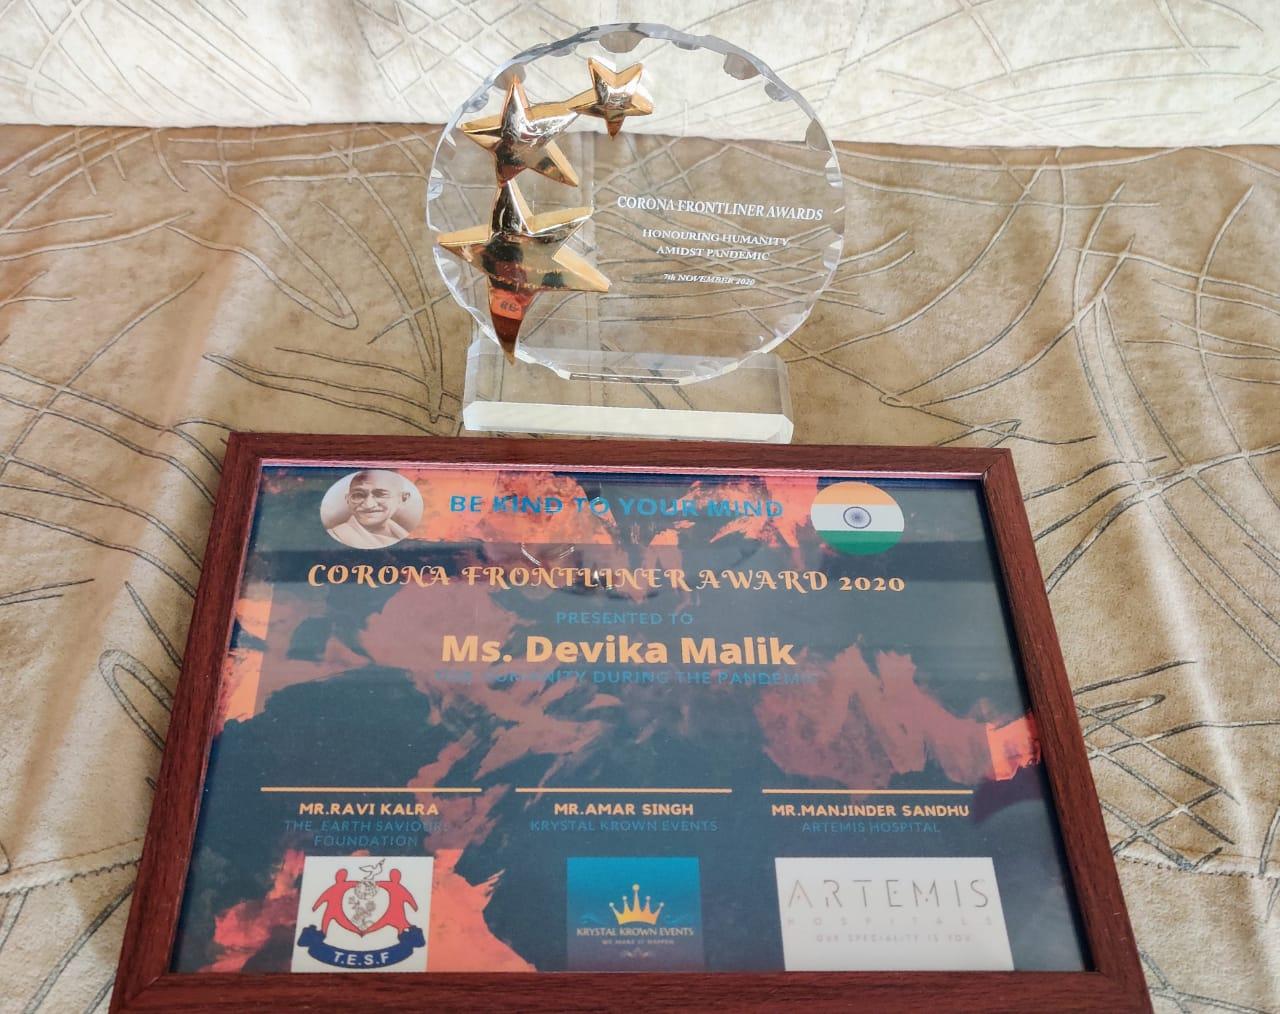 Corona Front liners Award